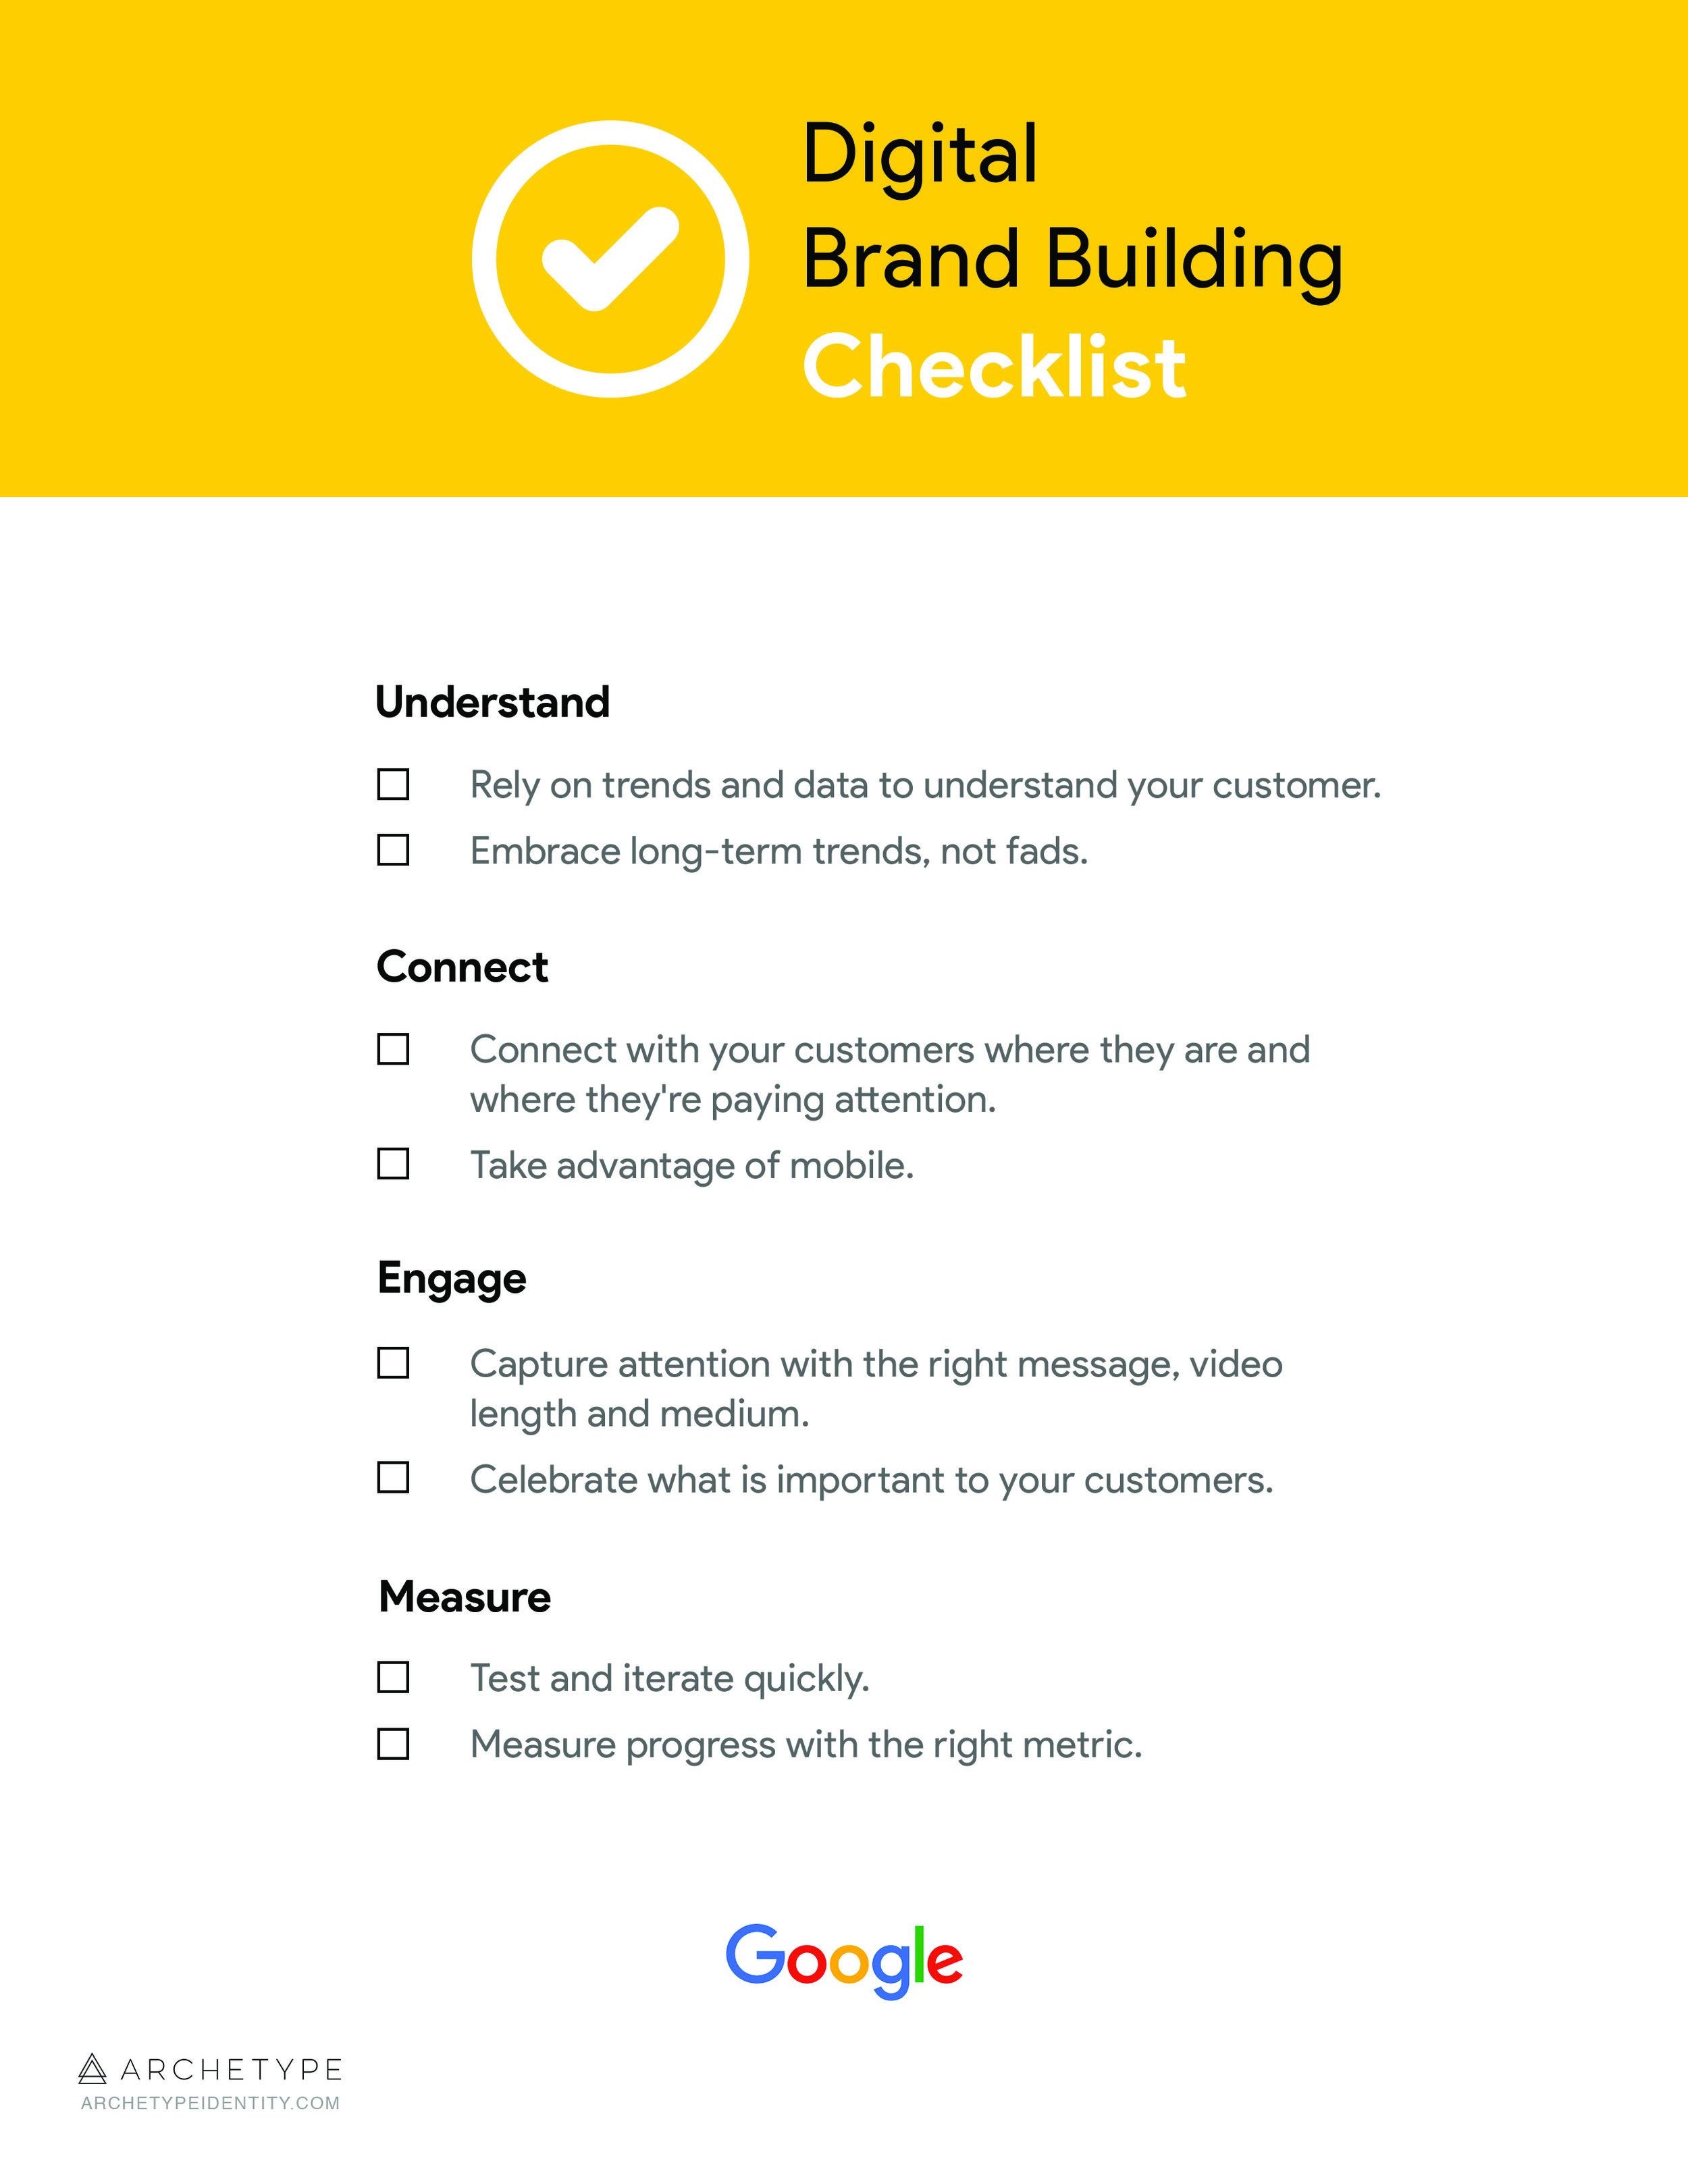 Google_BrandBuildingChecklist (1).jpg